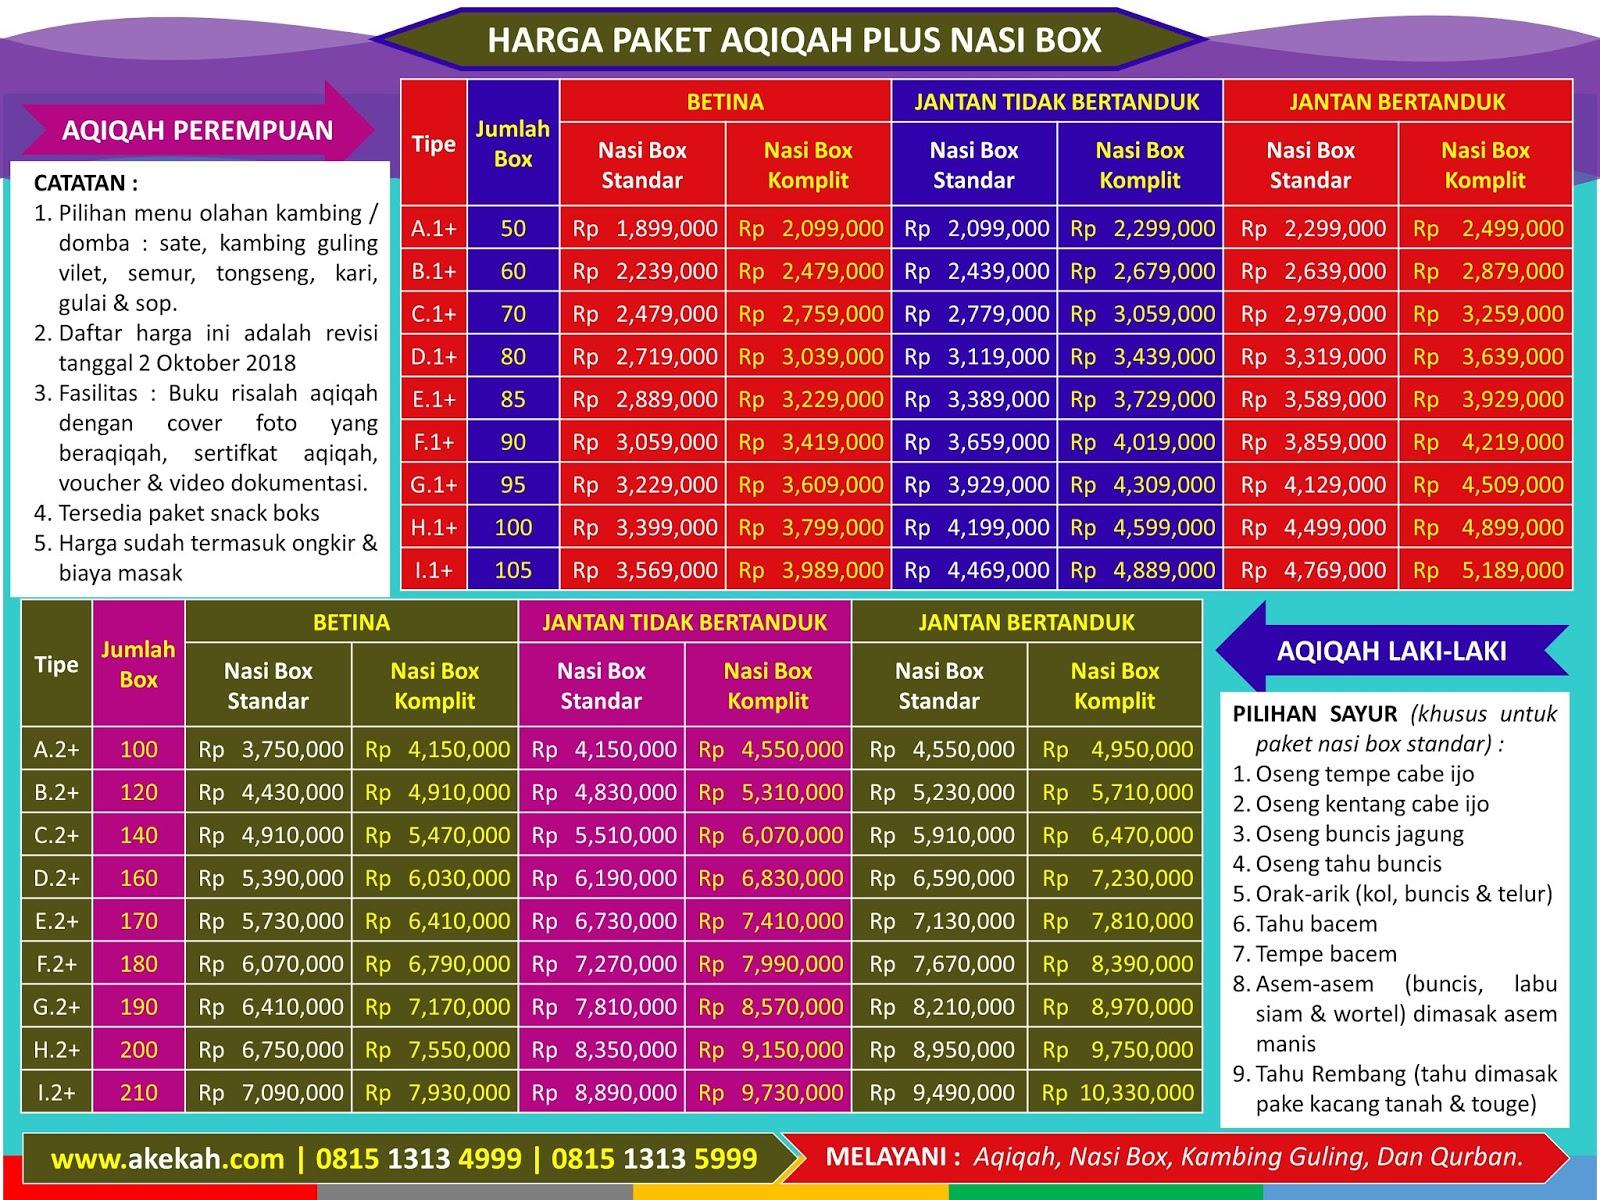 Kambing Aqiqah Dan Catering Untuk Laki-Laki Di Daerah Kecamatan Nanggung Kabupaten Bogor Jawa Barat